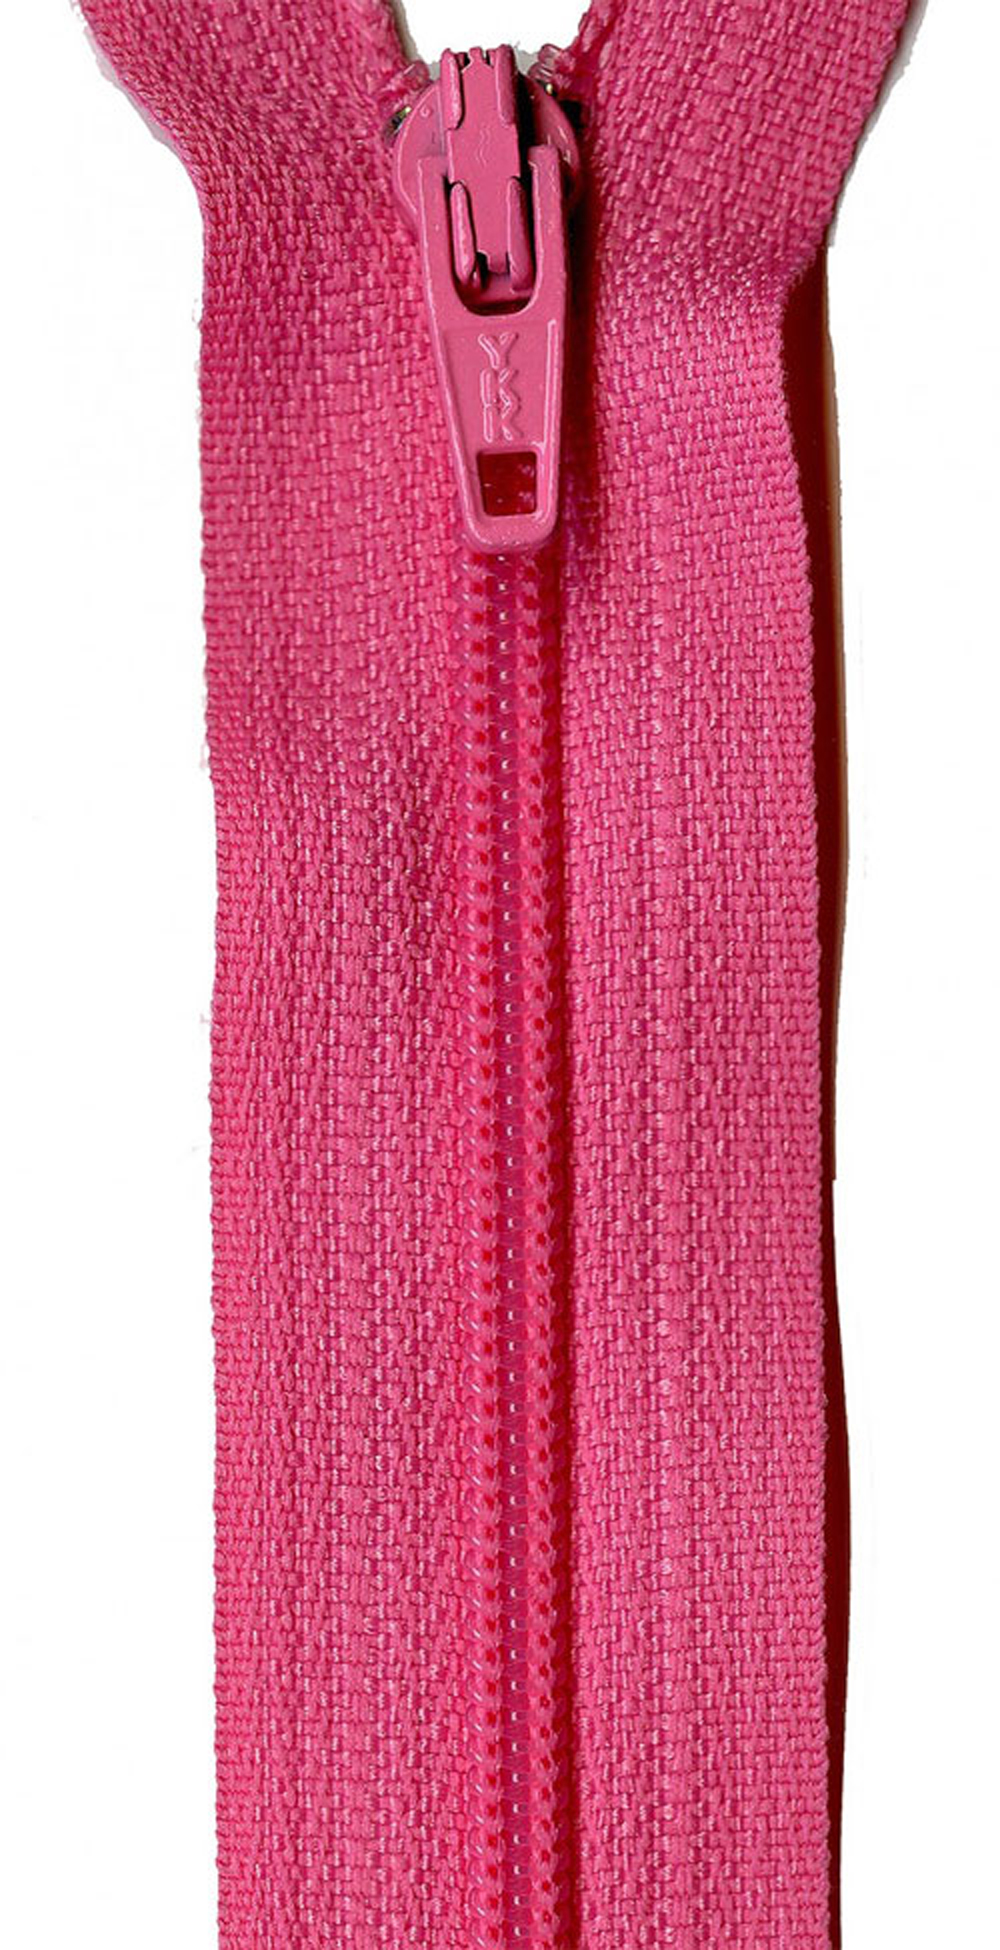 Zipper-YKK-22-inch-Rosy-Cheeks